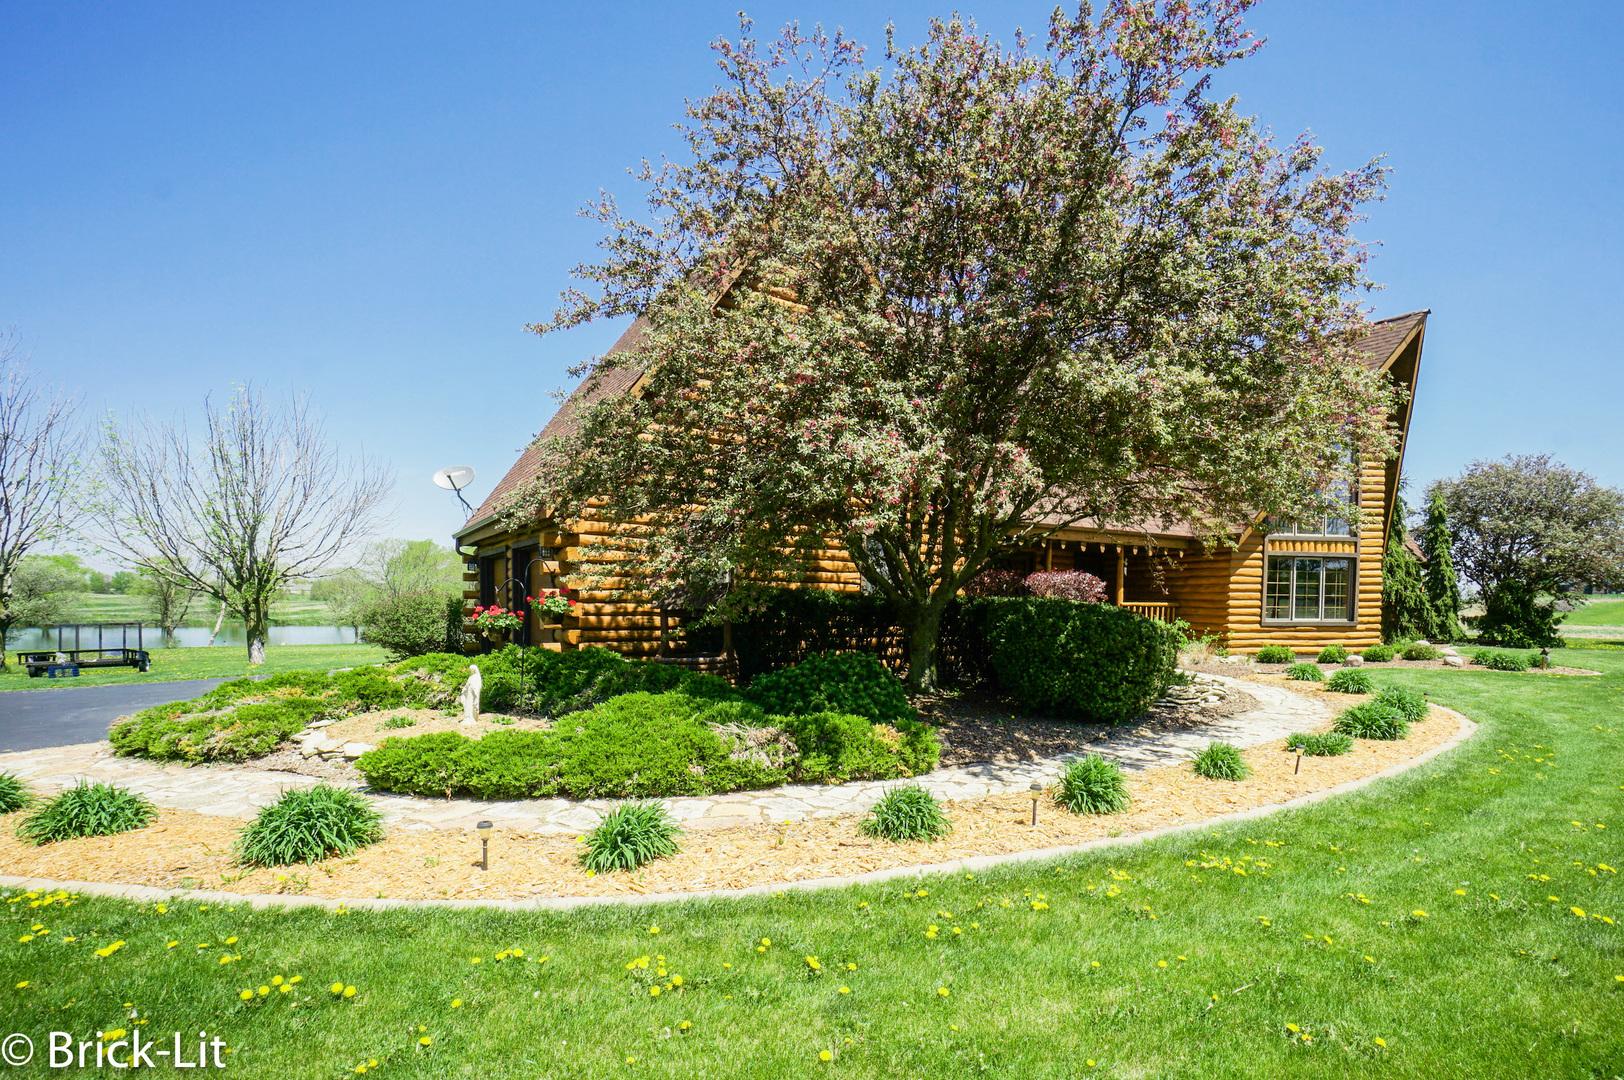 11842 West Offner, Peotone, Illinois, 60468